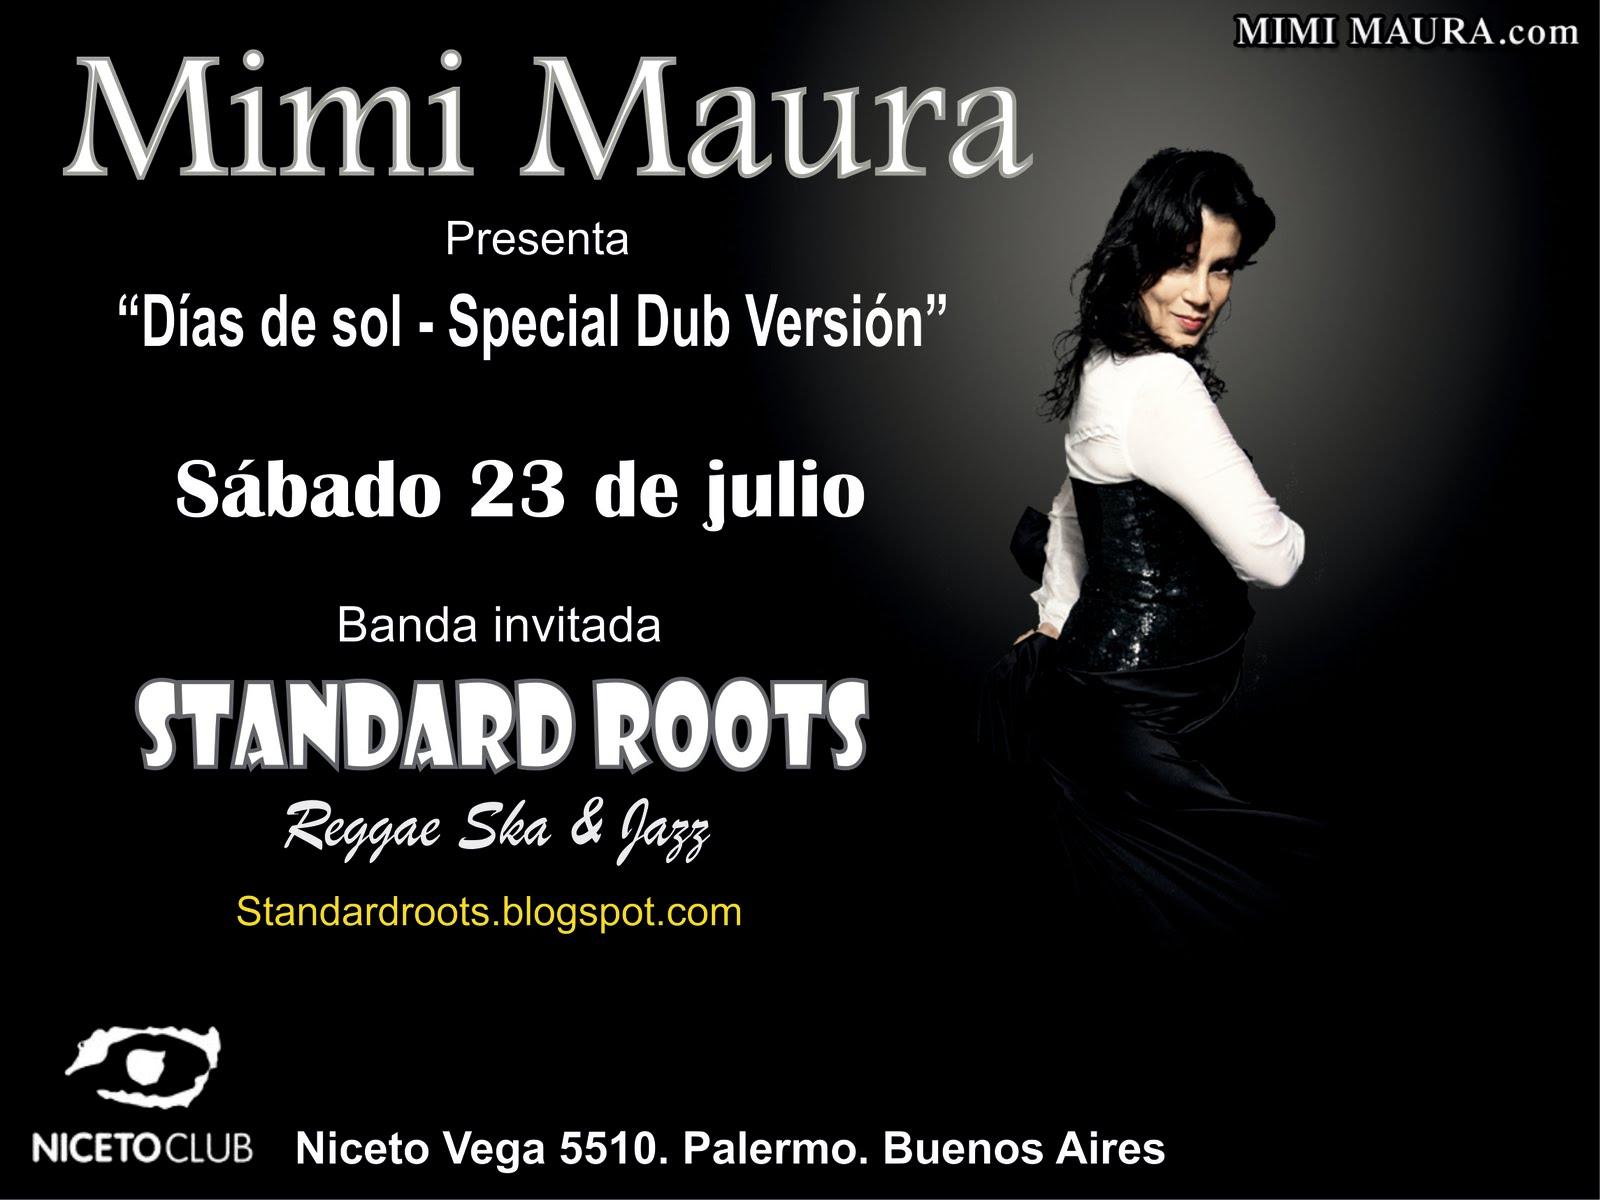 Mimi Maura-Standard Roots - 23 de Julio